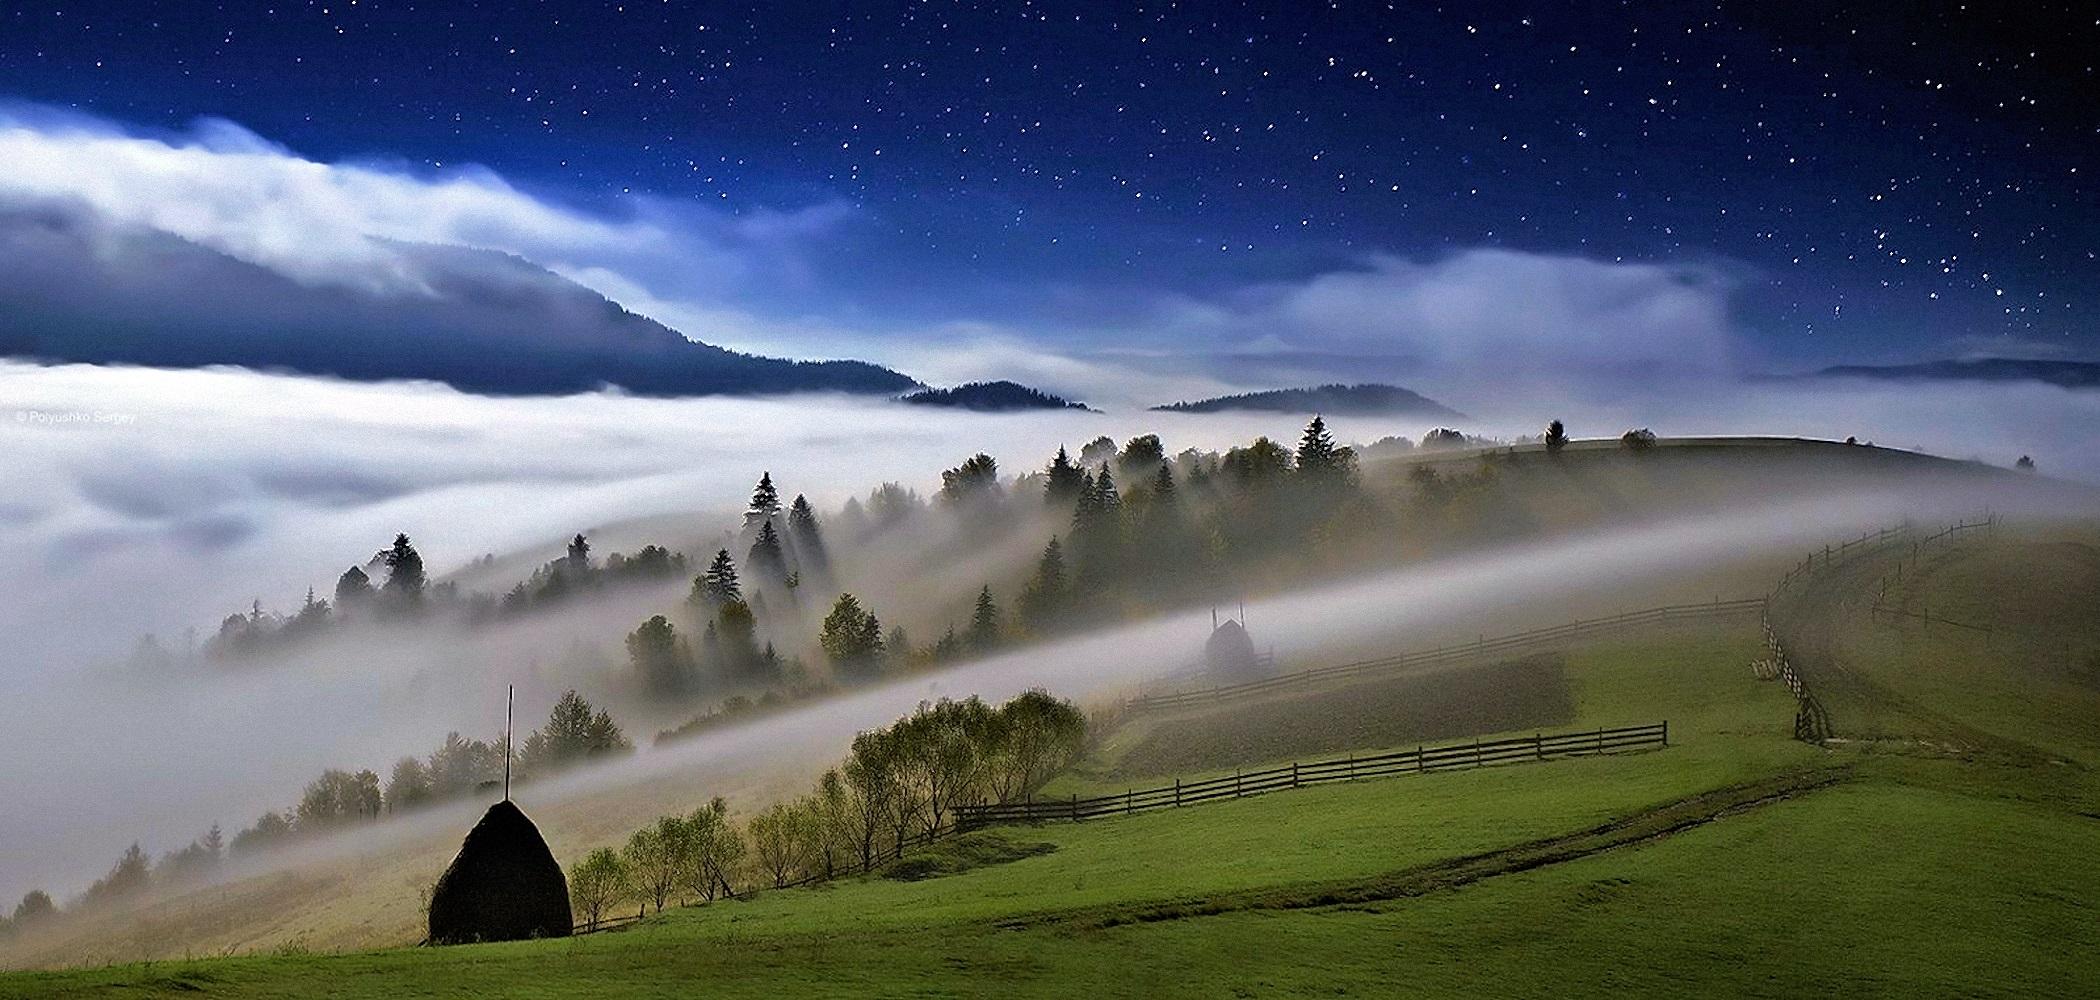 Riko - The Fog